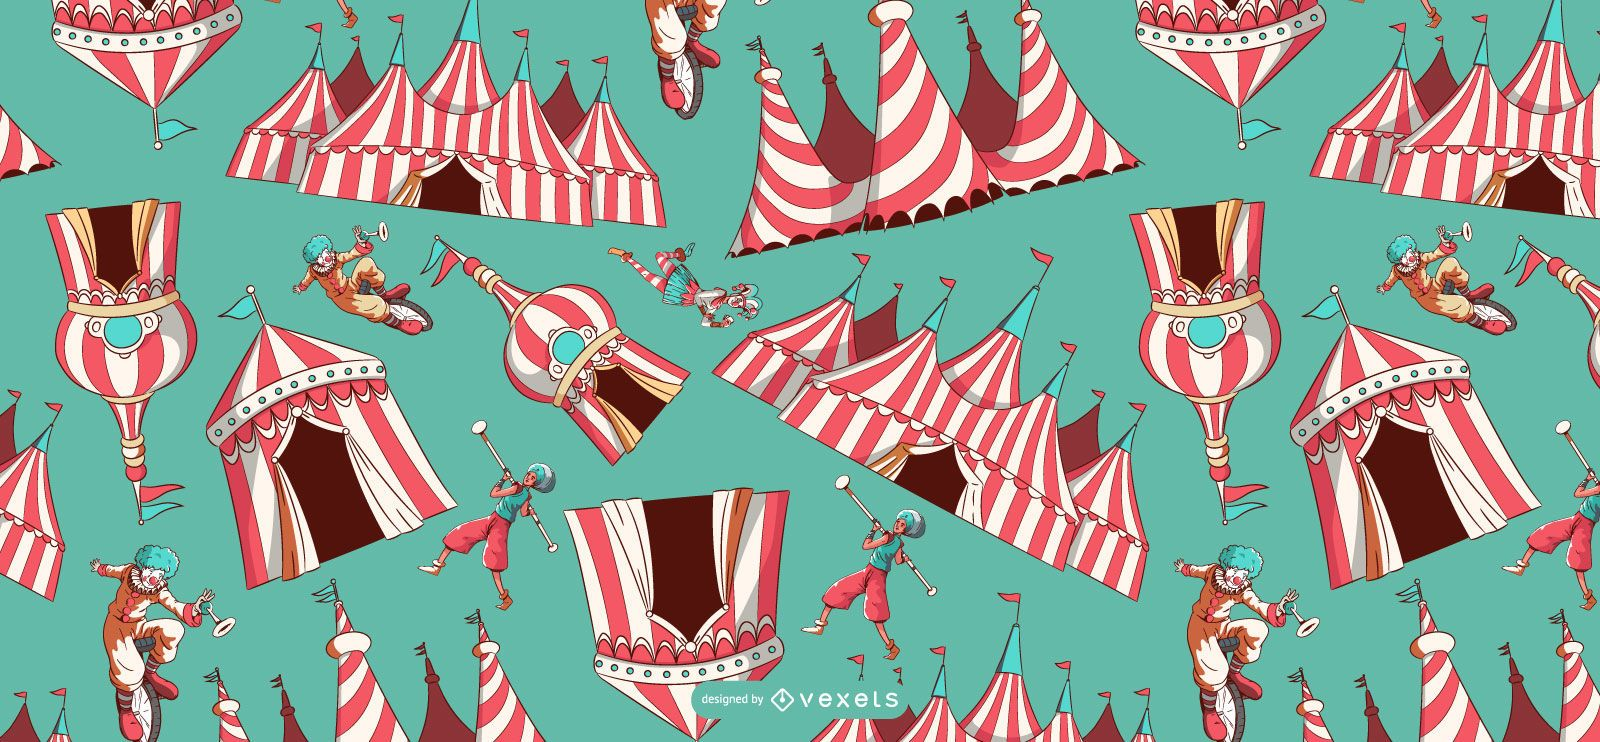 Circus tents pattern design